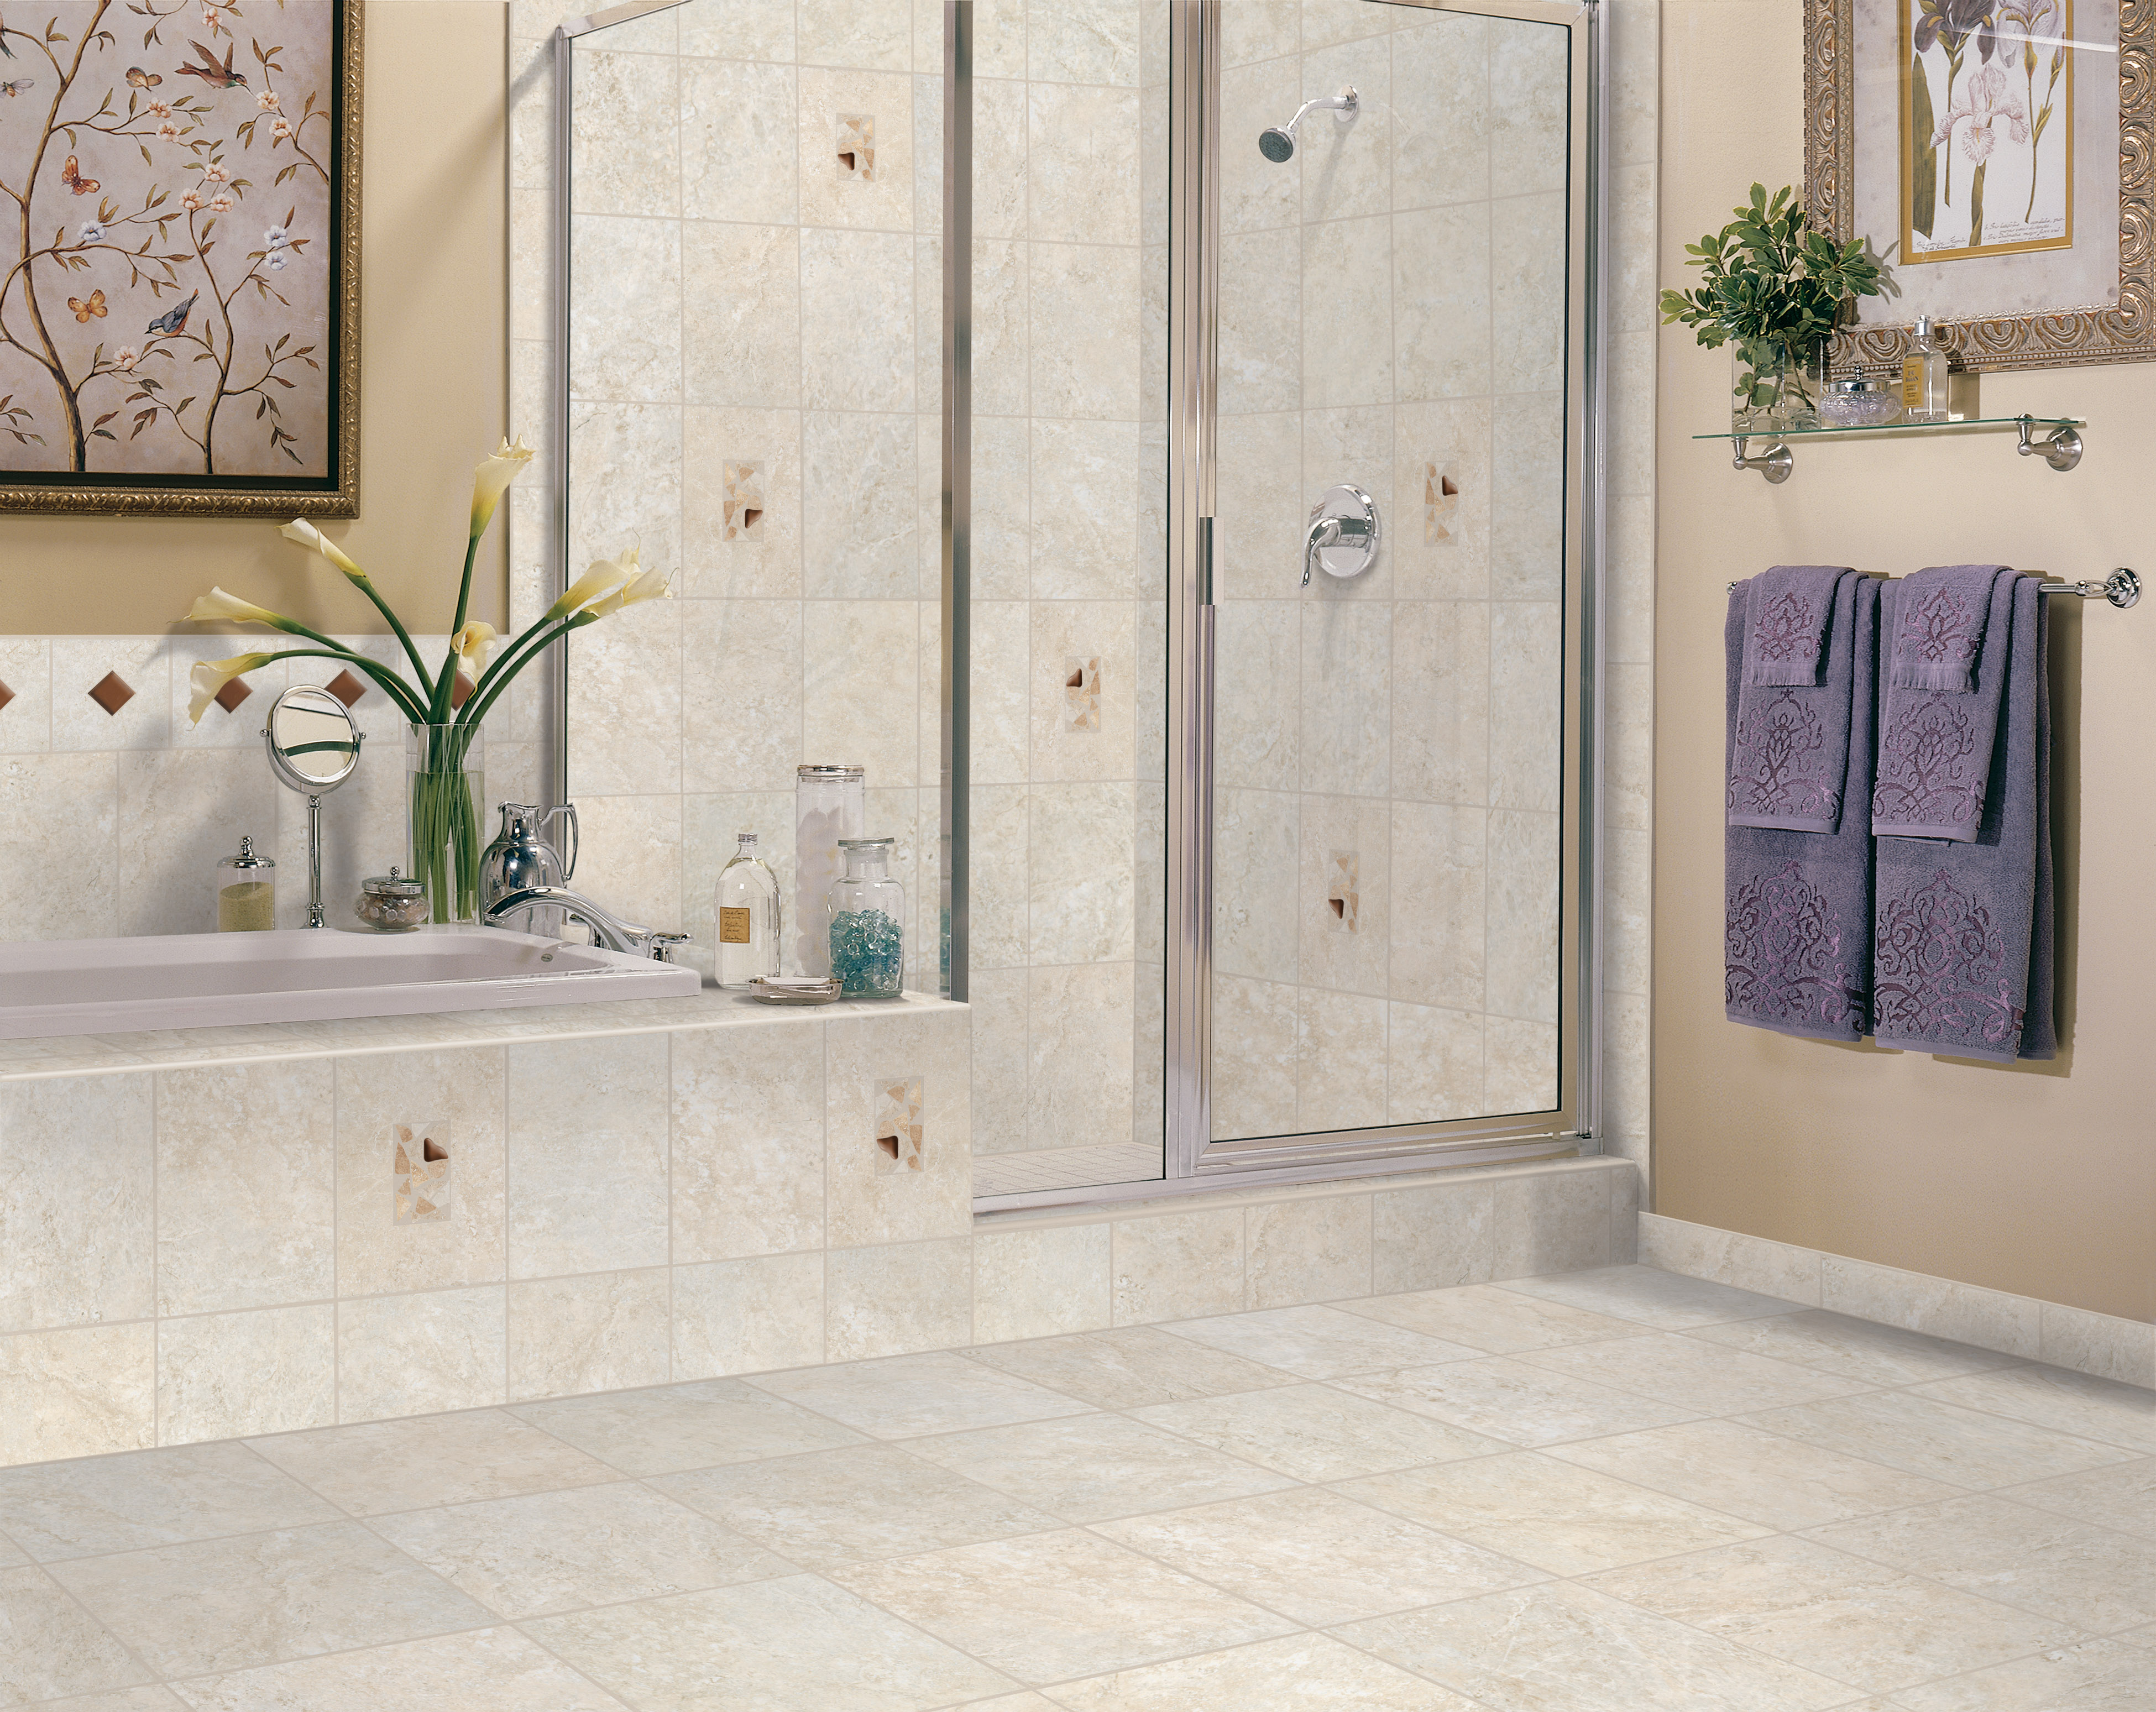 Comfortable Porcelain Vs Ceramic Difference Between Ceramic Tile Vs